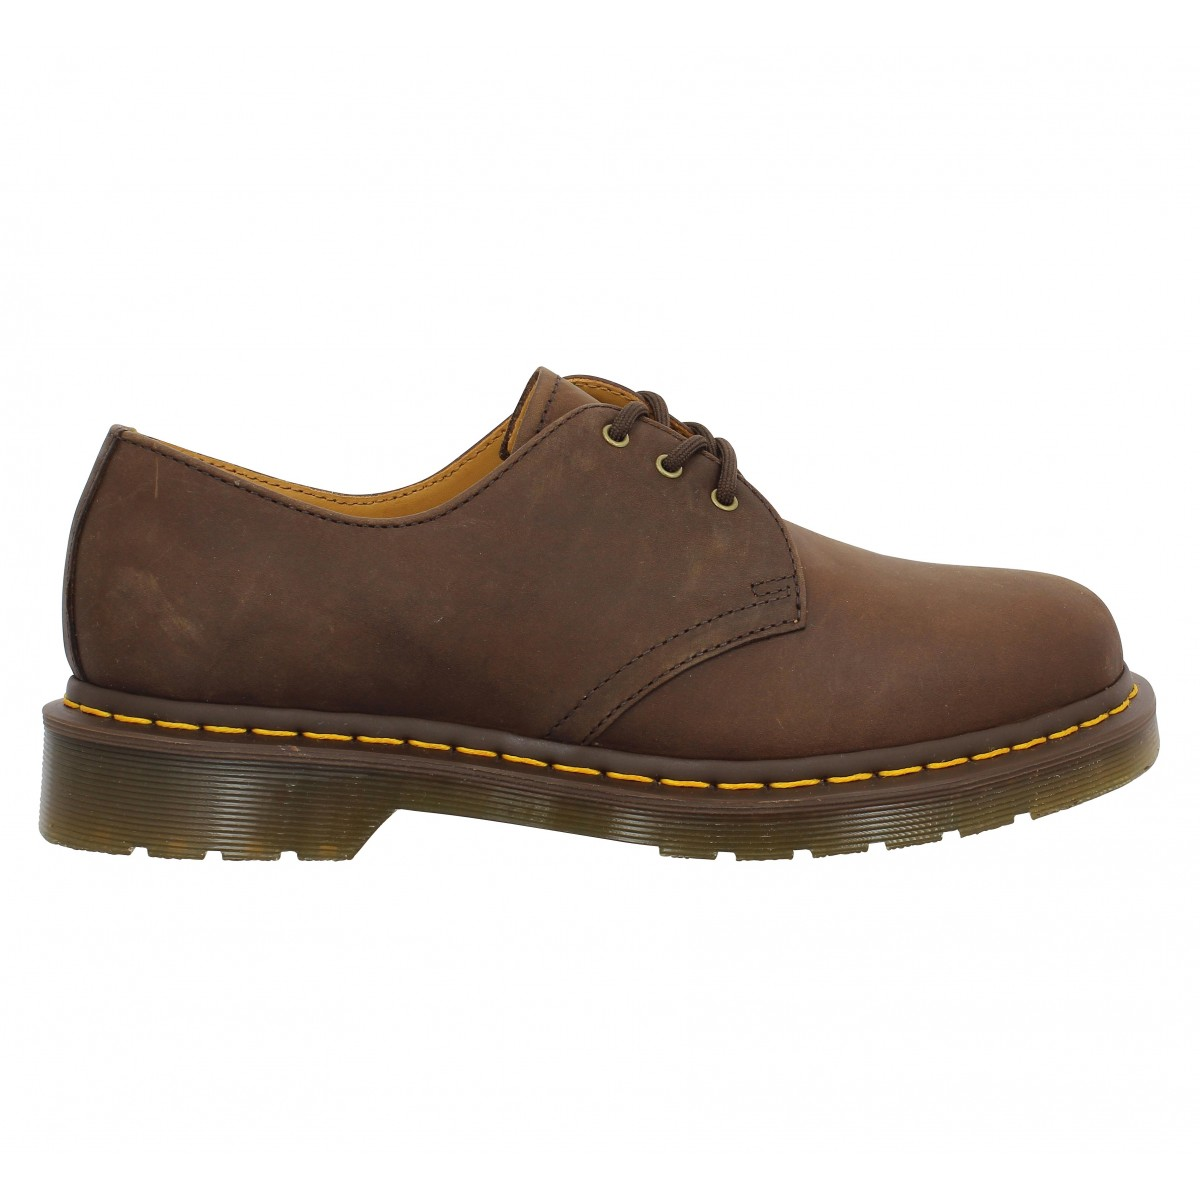 dr martens 1461 cuir gras homme marron homme fanny chaussures. Black Bedroom Furniture Sets. Home Design Ideas